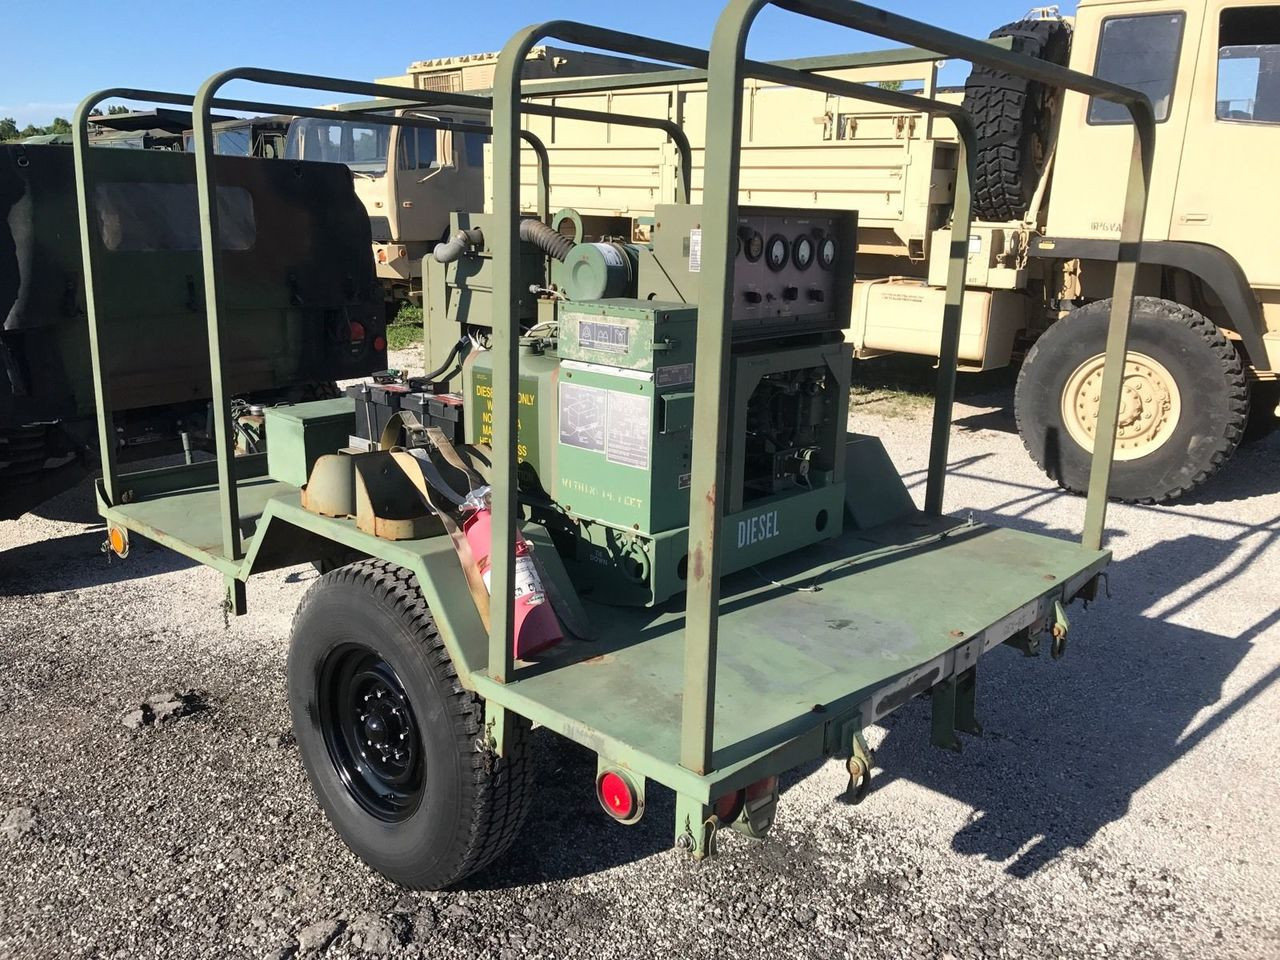 MILITARY MEP-002A 5KW 120 240 VAC 1 & 3 PHASE PORTABLE DIESEL GENERATOR TRAILER